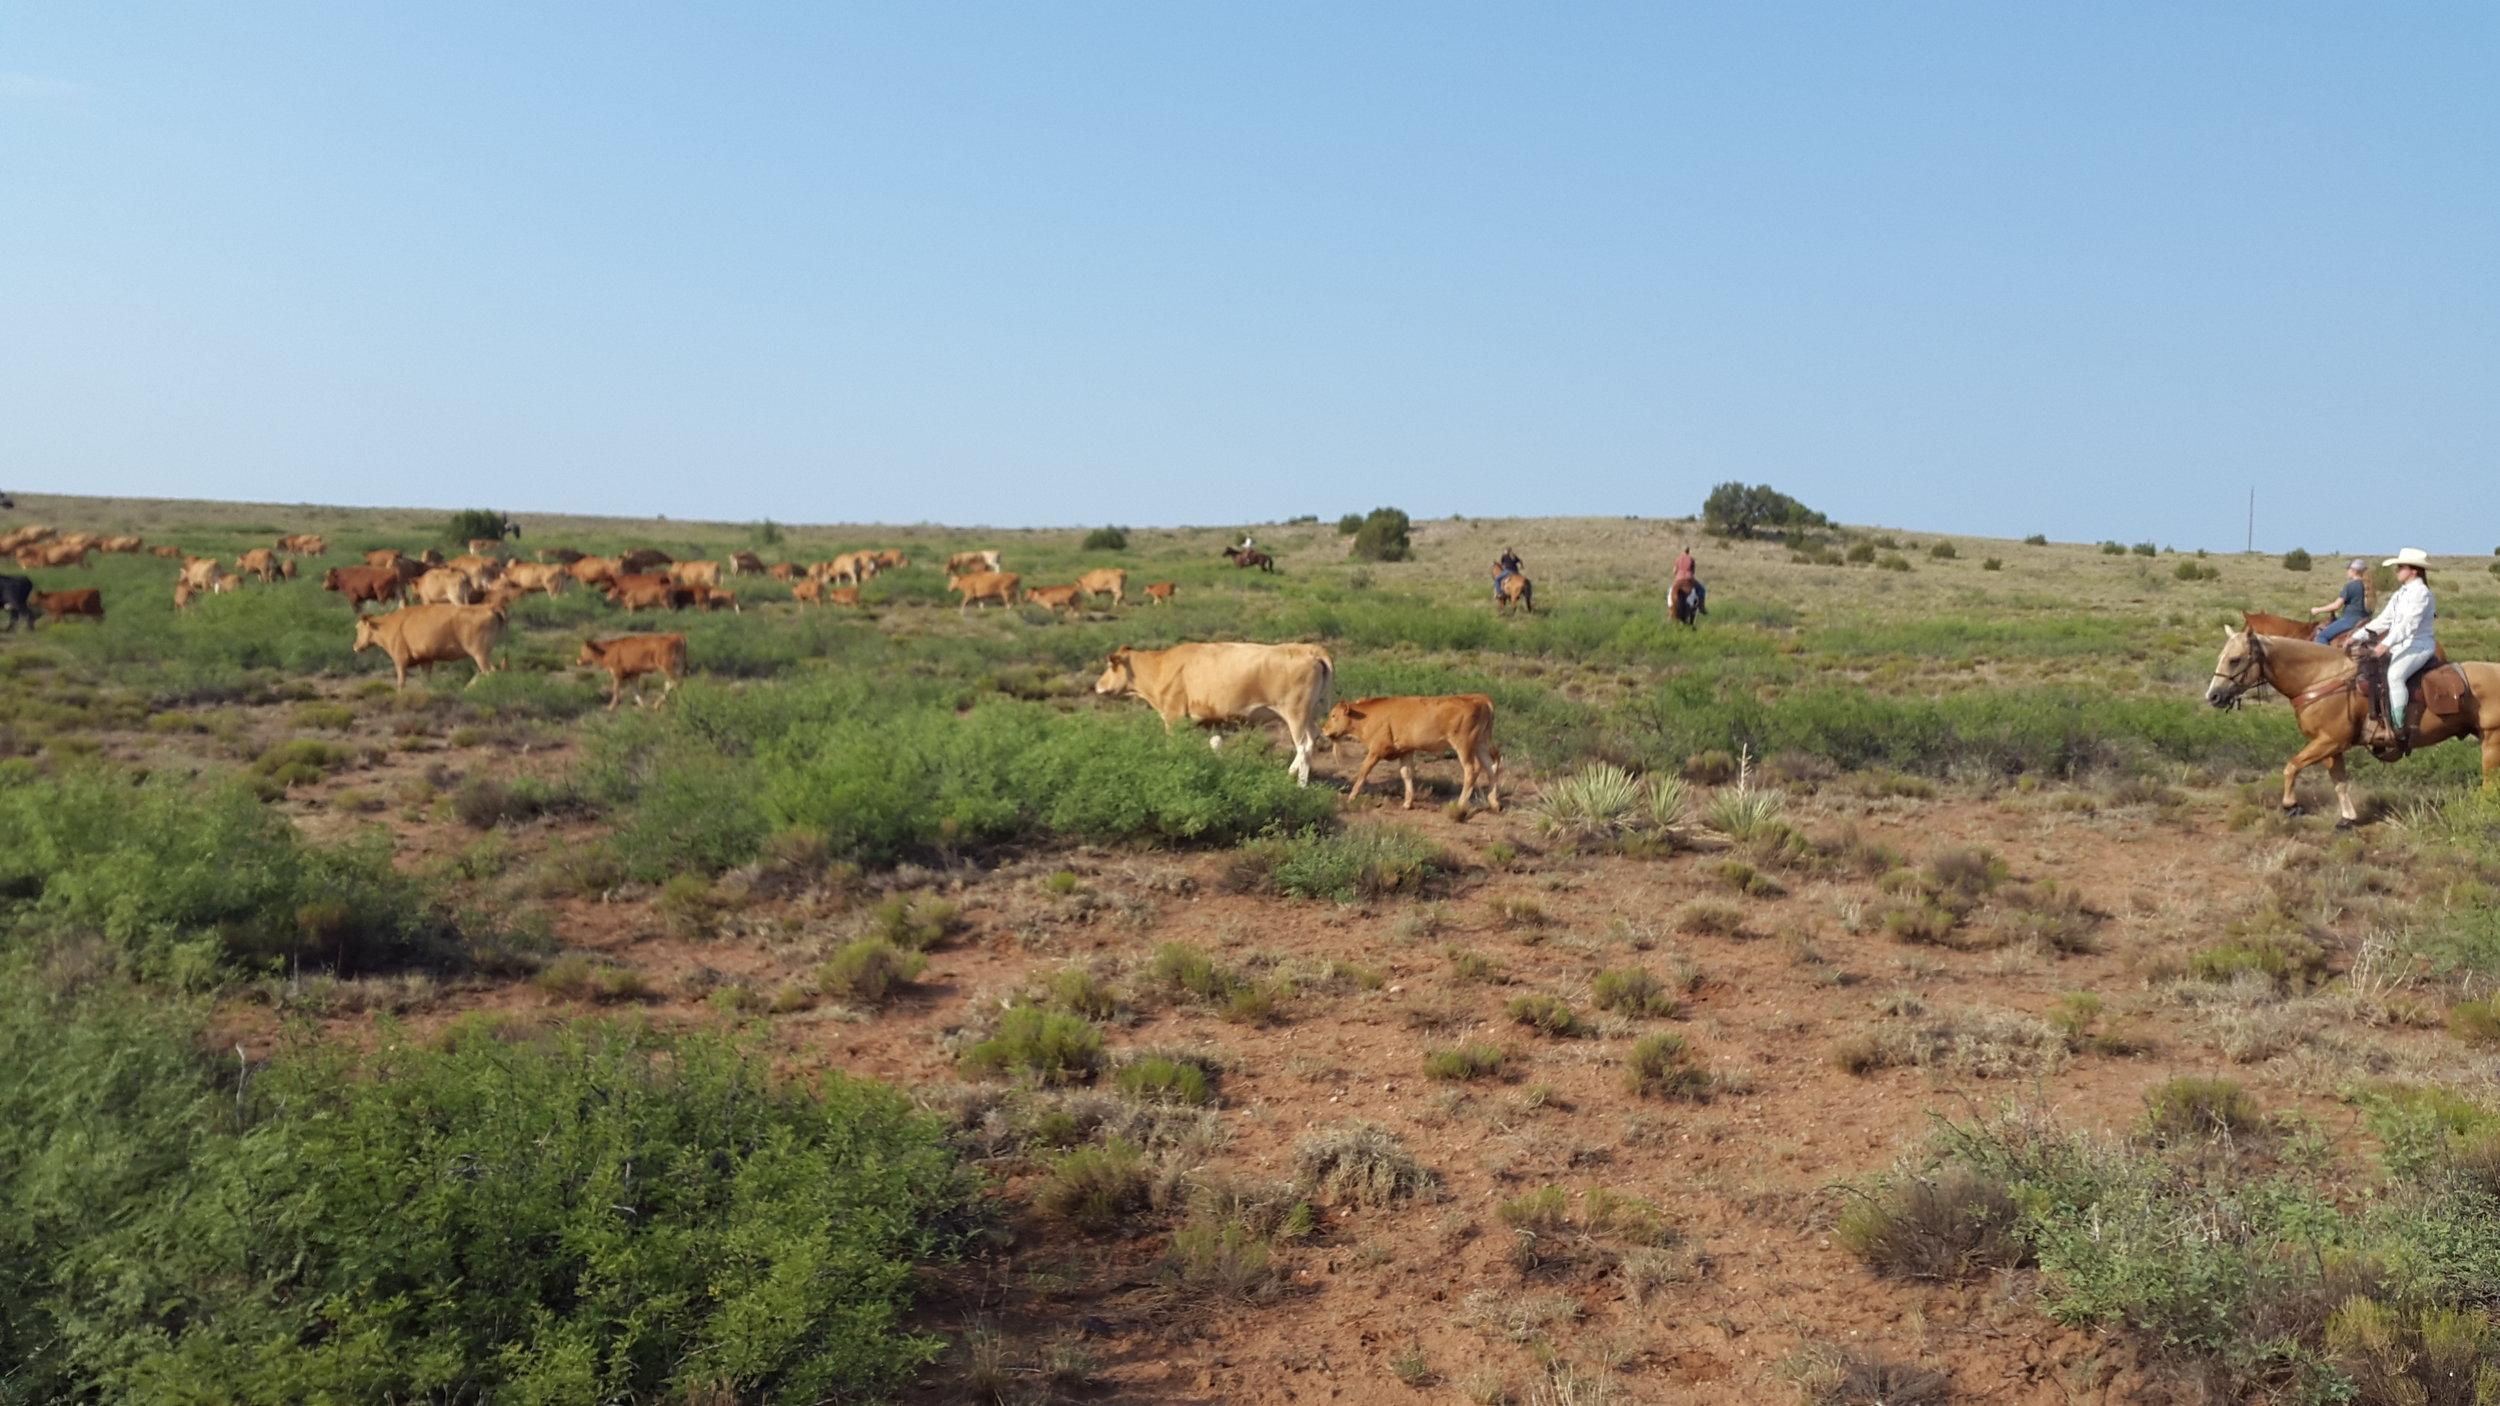 One day later we helped family Robbins again gathering cattle - this time Akaushi cattle (also called Japanese Brown).  Einen Tag später haben wir alle erneut Familie Robbins geholfen Rinder einzutreiben - diesmal Akaushi Rinder (auch Japanese Brown genannt).